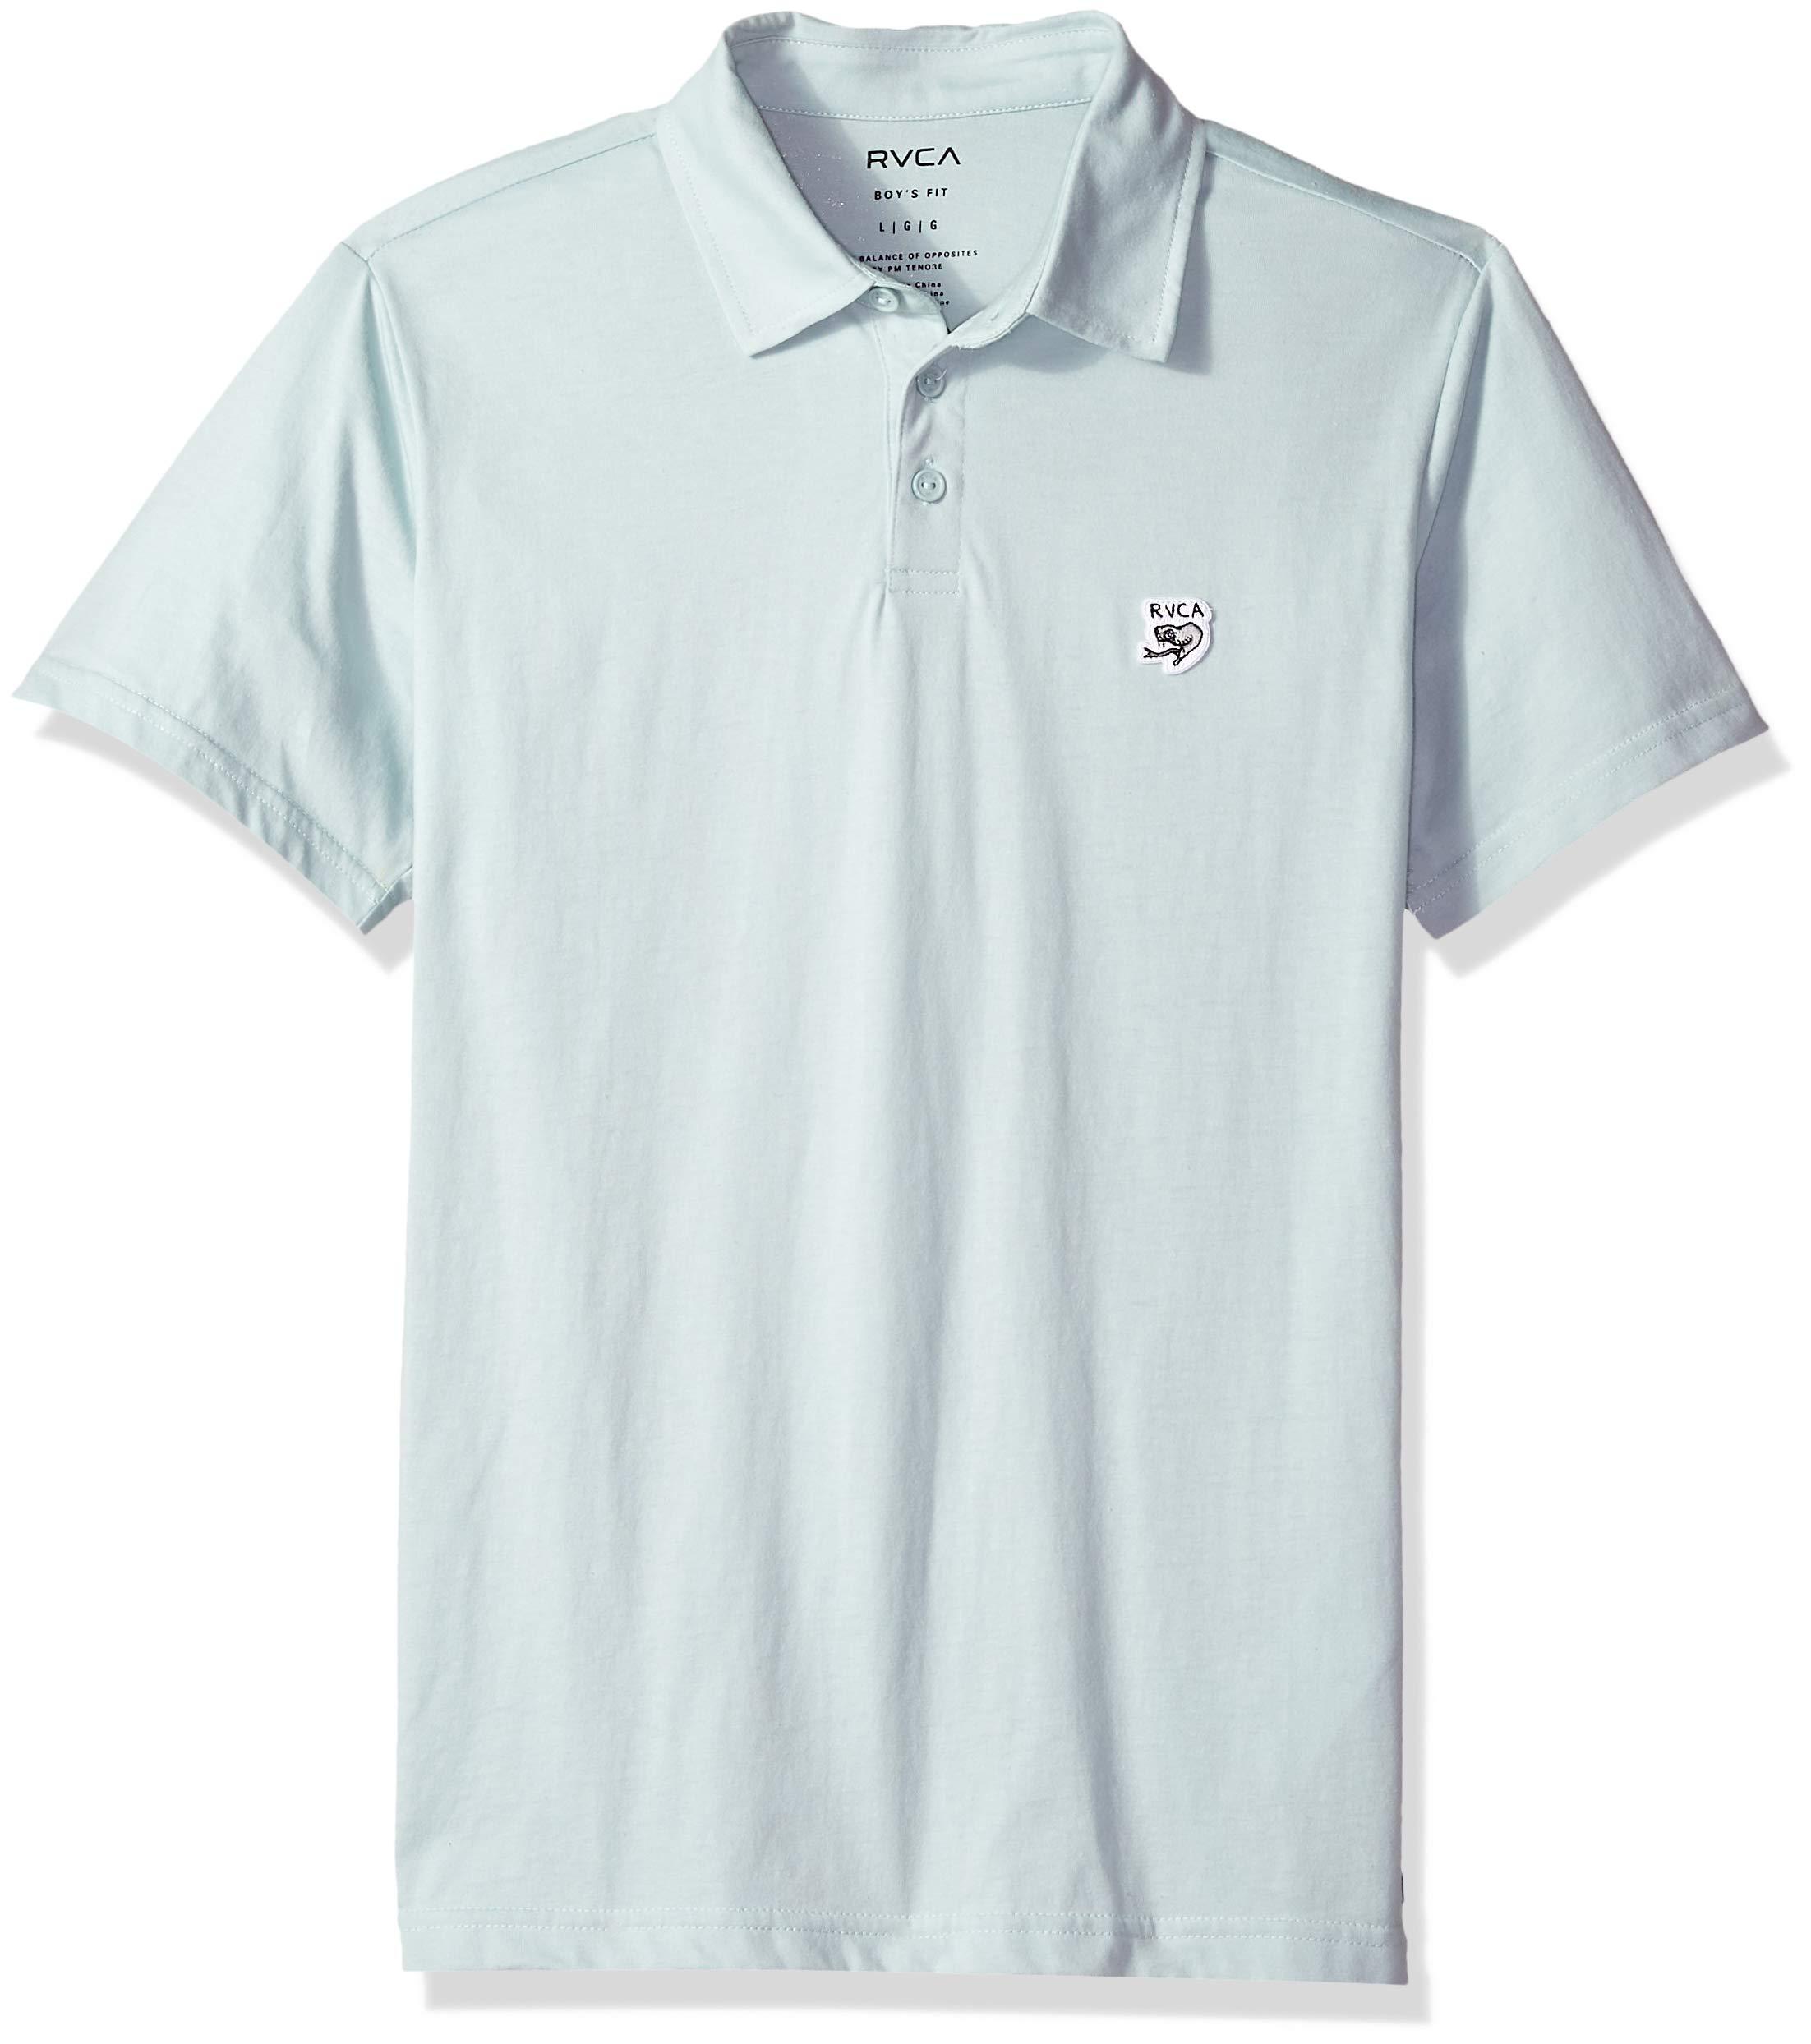 RVCA Boys' Big Sure Thing ANP Polo Shirt, Ether Blue, L